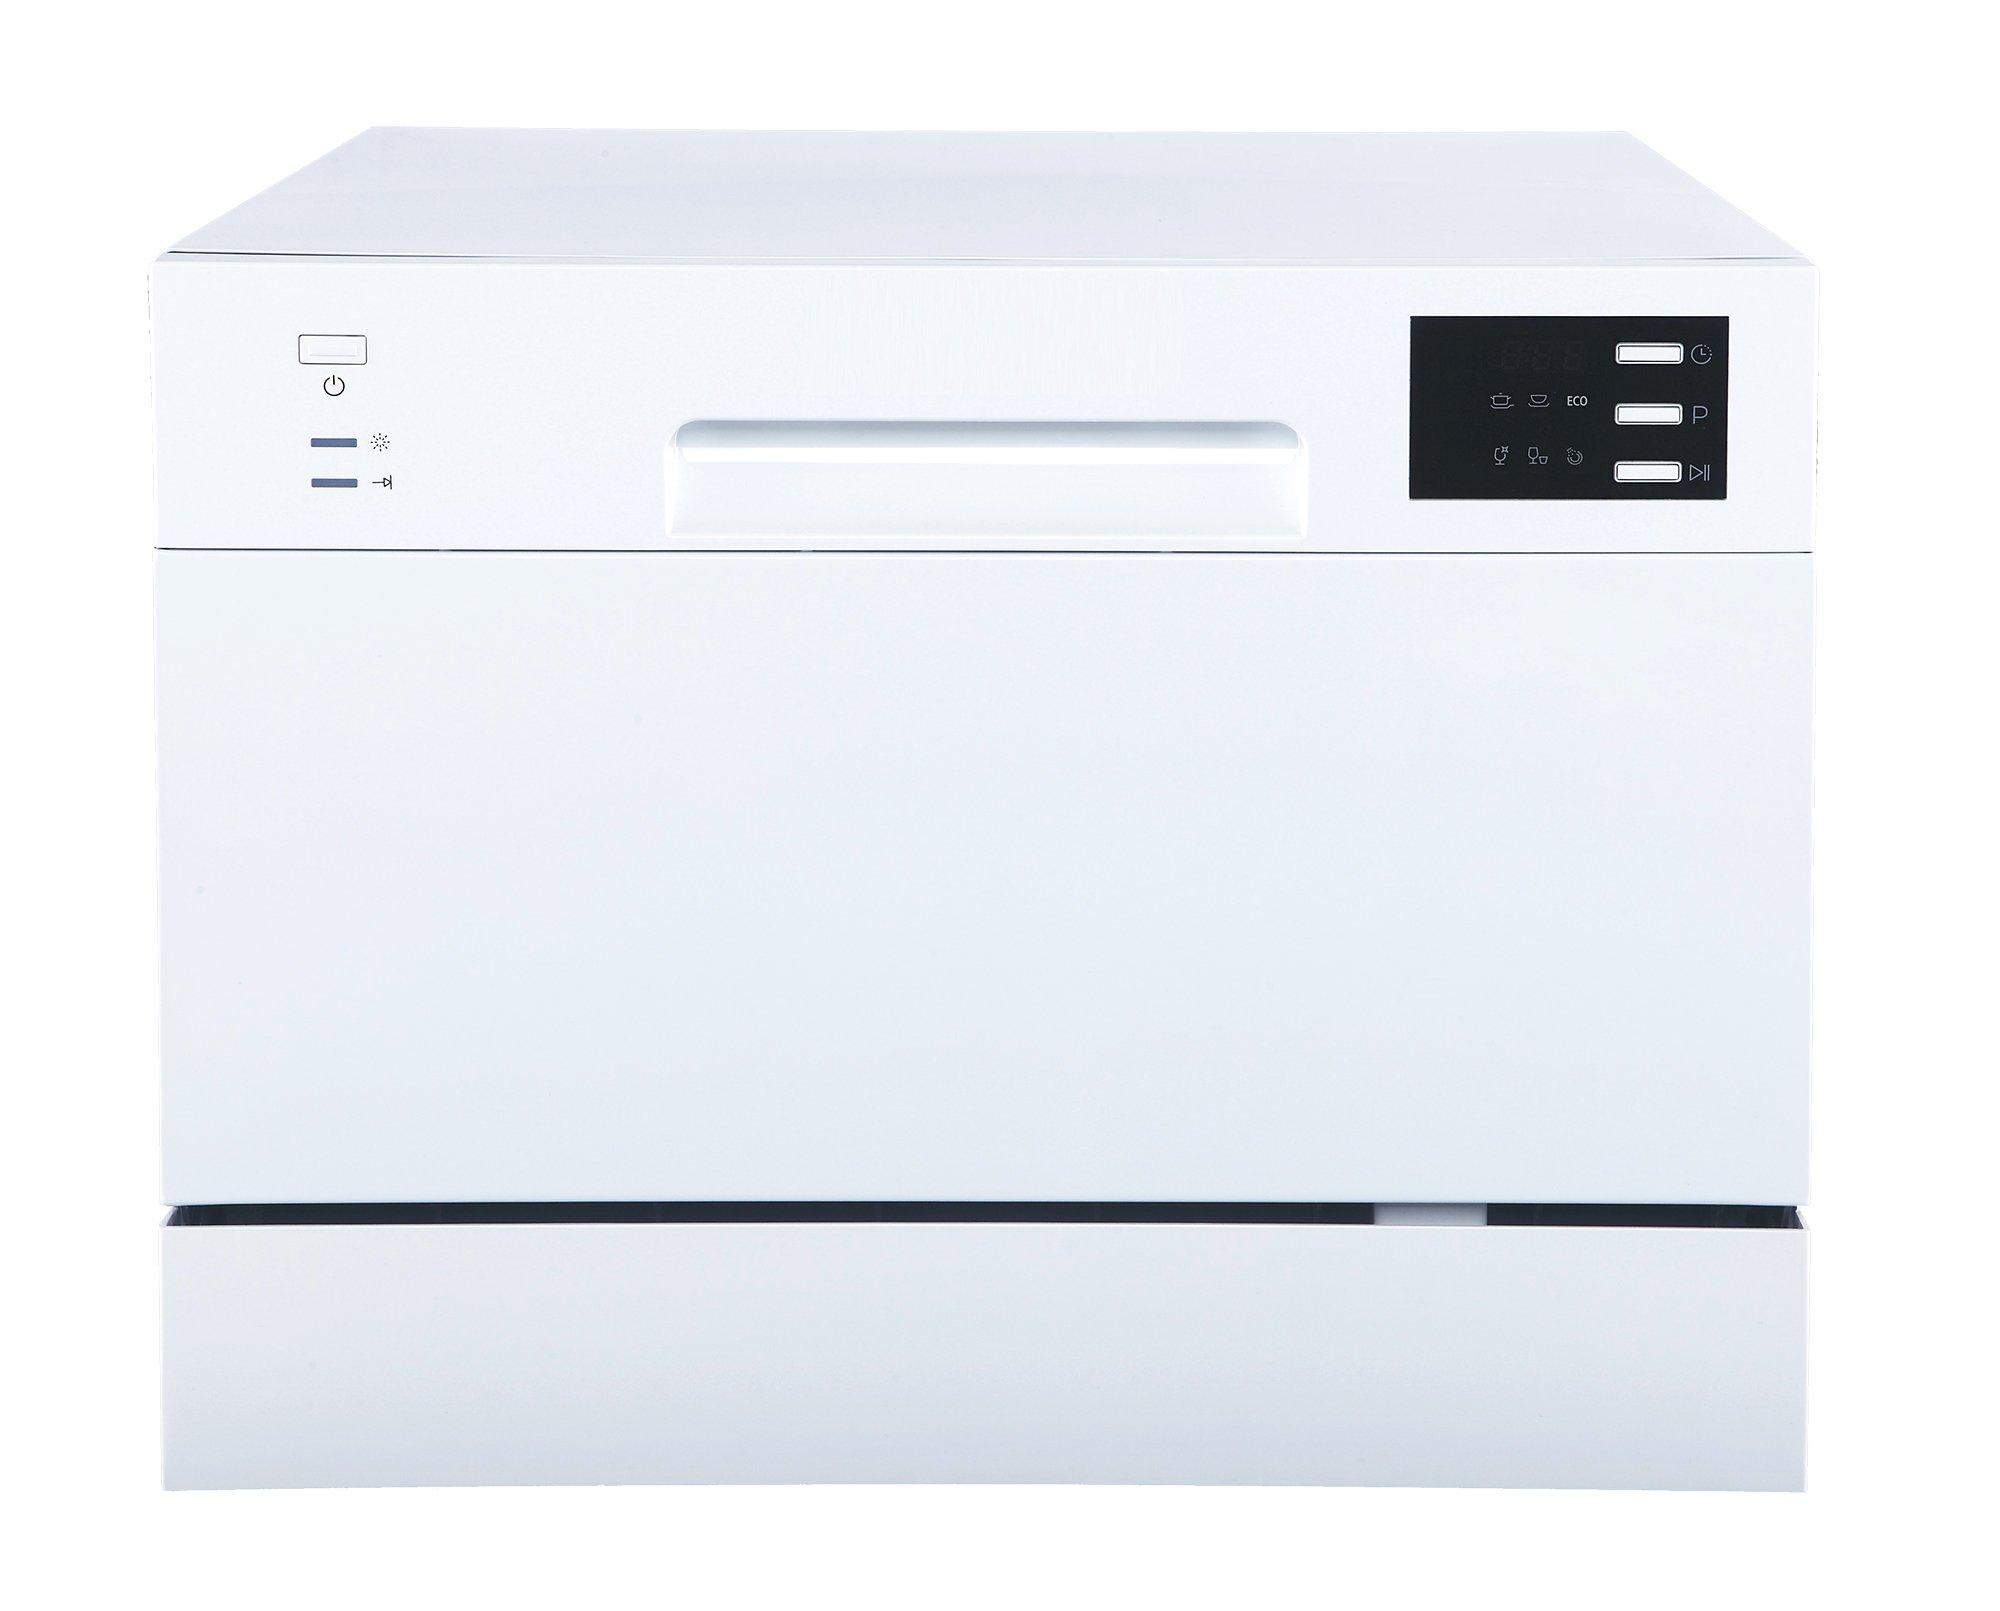 SPT SD-2225DW Countertop Dishwasher with Delay Start & LED, White, White